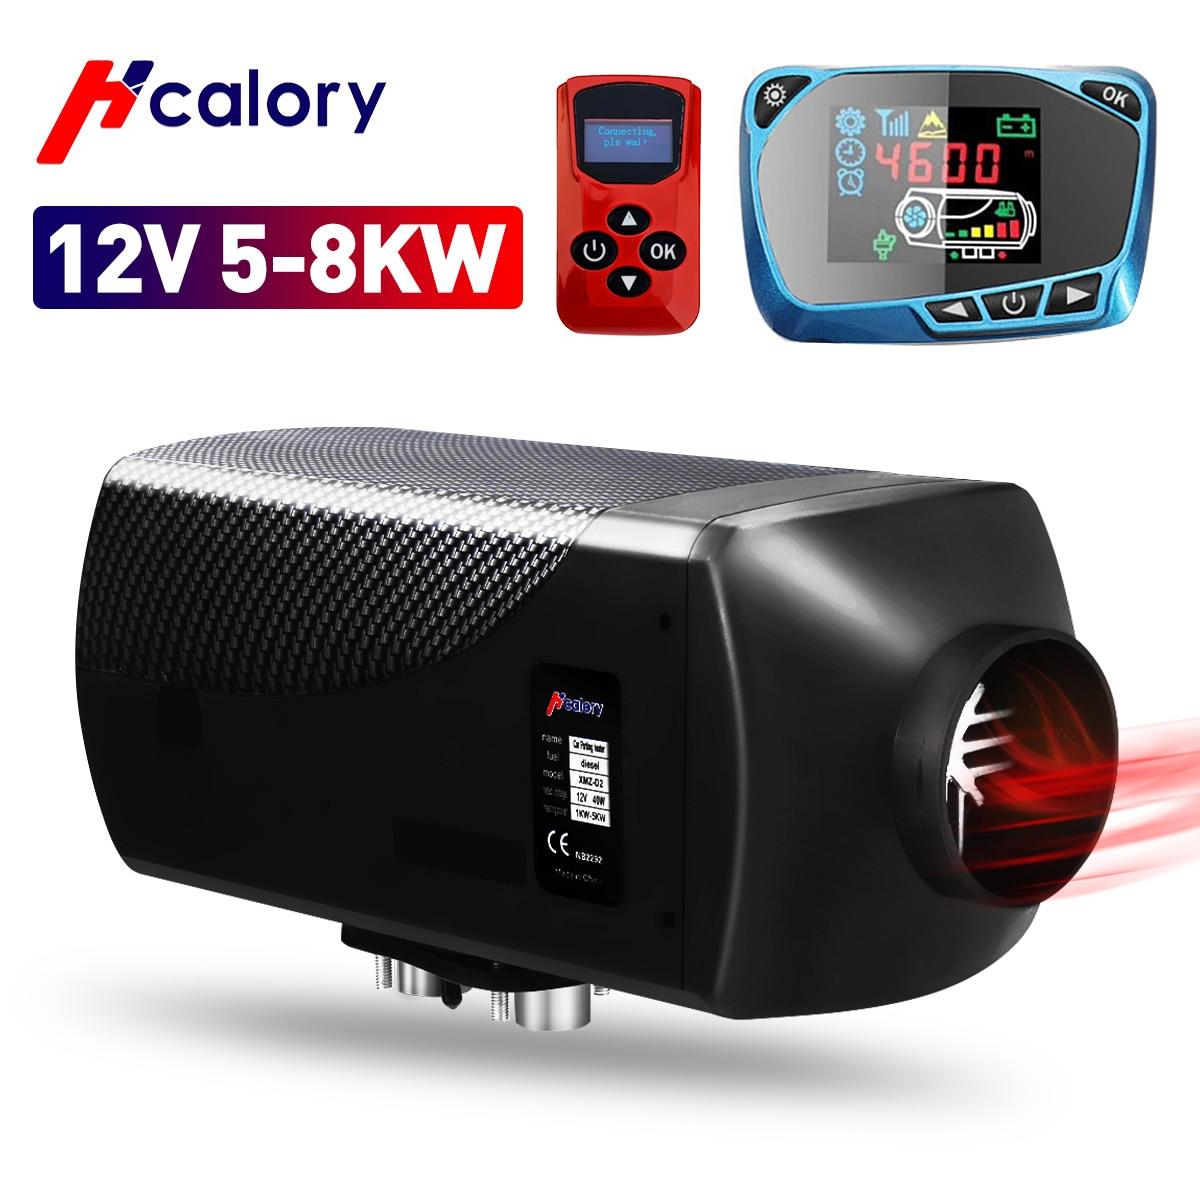 HCalory الهواء مدفأة الديزل 5-8KW 12 فولت سخان سيارة كبيرة التبديل سخان التوقف مجهزة جهاز التحكم عن بعد ل شاحنة رافعة شوكية حافلة